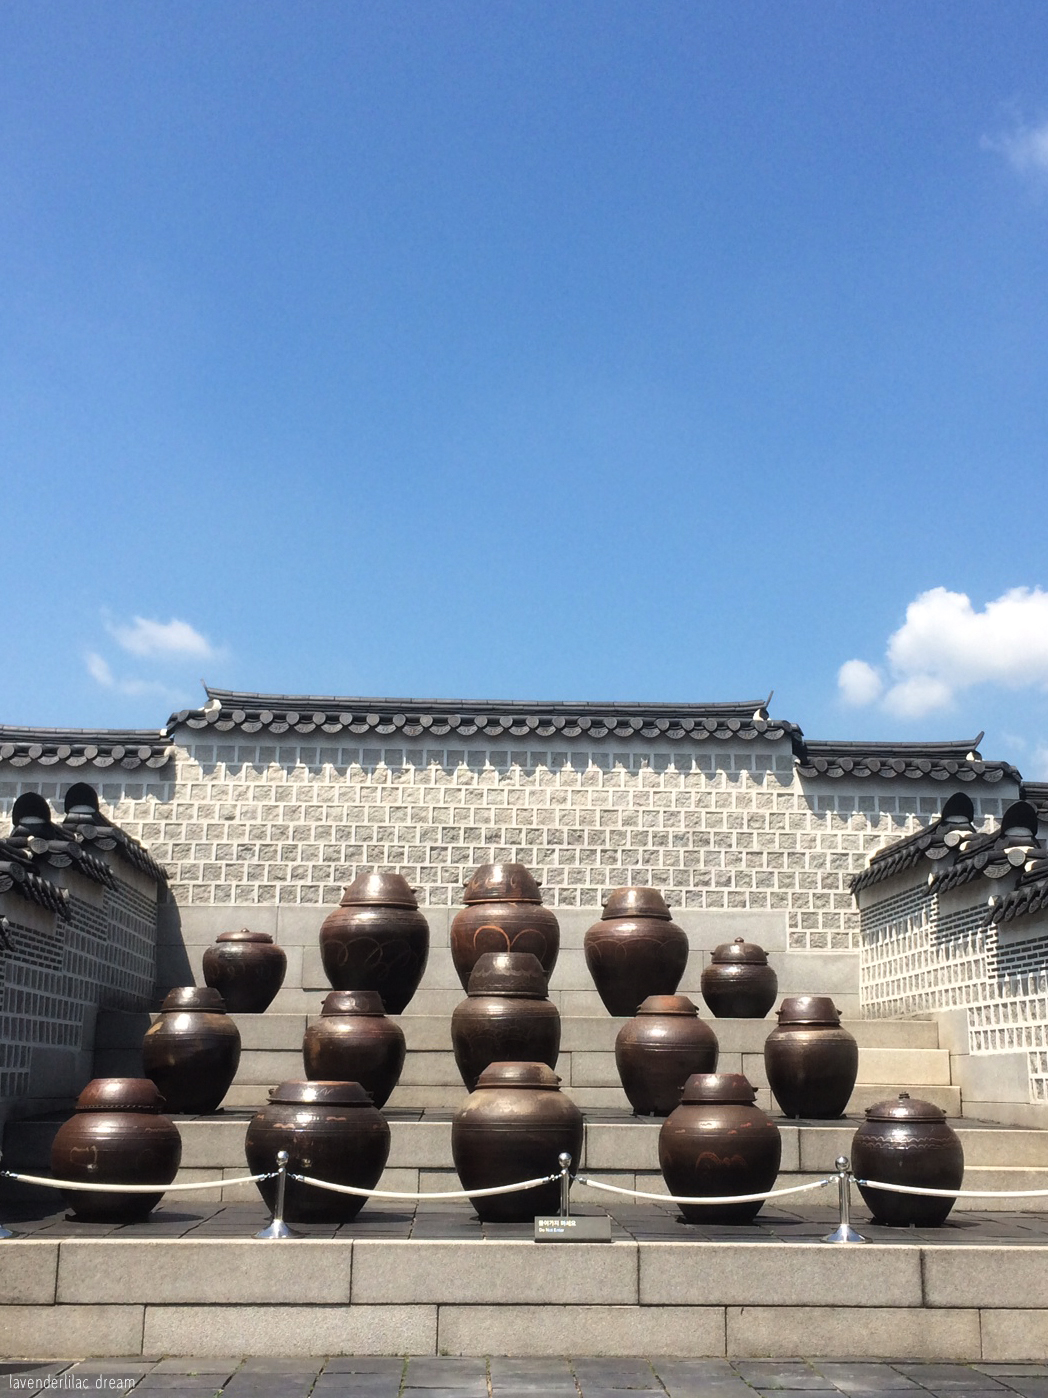 Seoul, Korea - Summer Study Abroad 2014 - Seoul City Touring - Gyeongbokgung 경복궁 景福宫